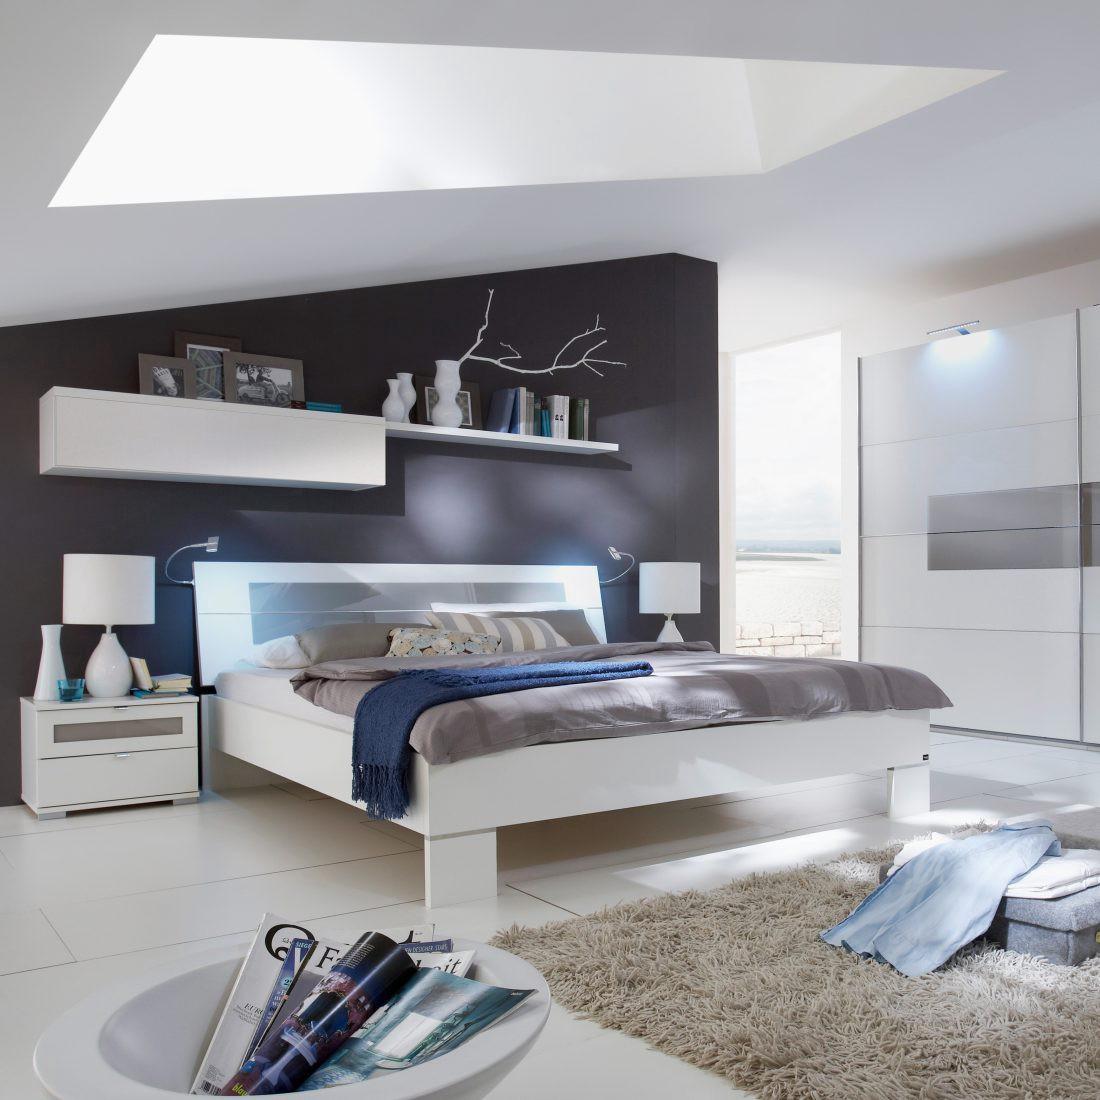 Schlafzimmerkombination Advantage (4-teilig) – Alpinweiß/Sandgrau/Glas Grau, fresh to go günstig kaufen